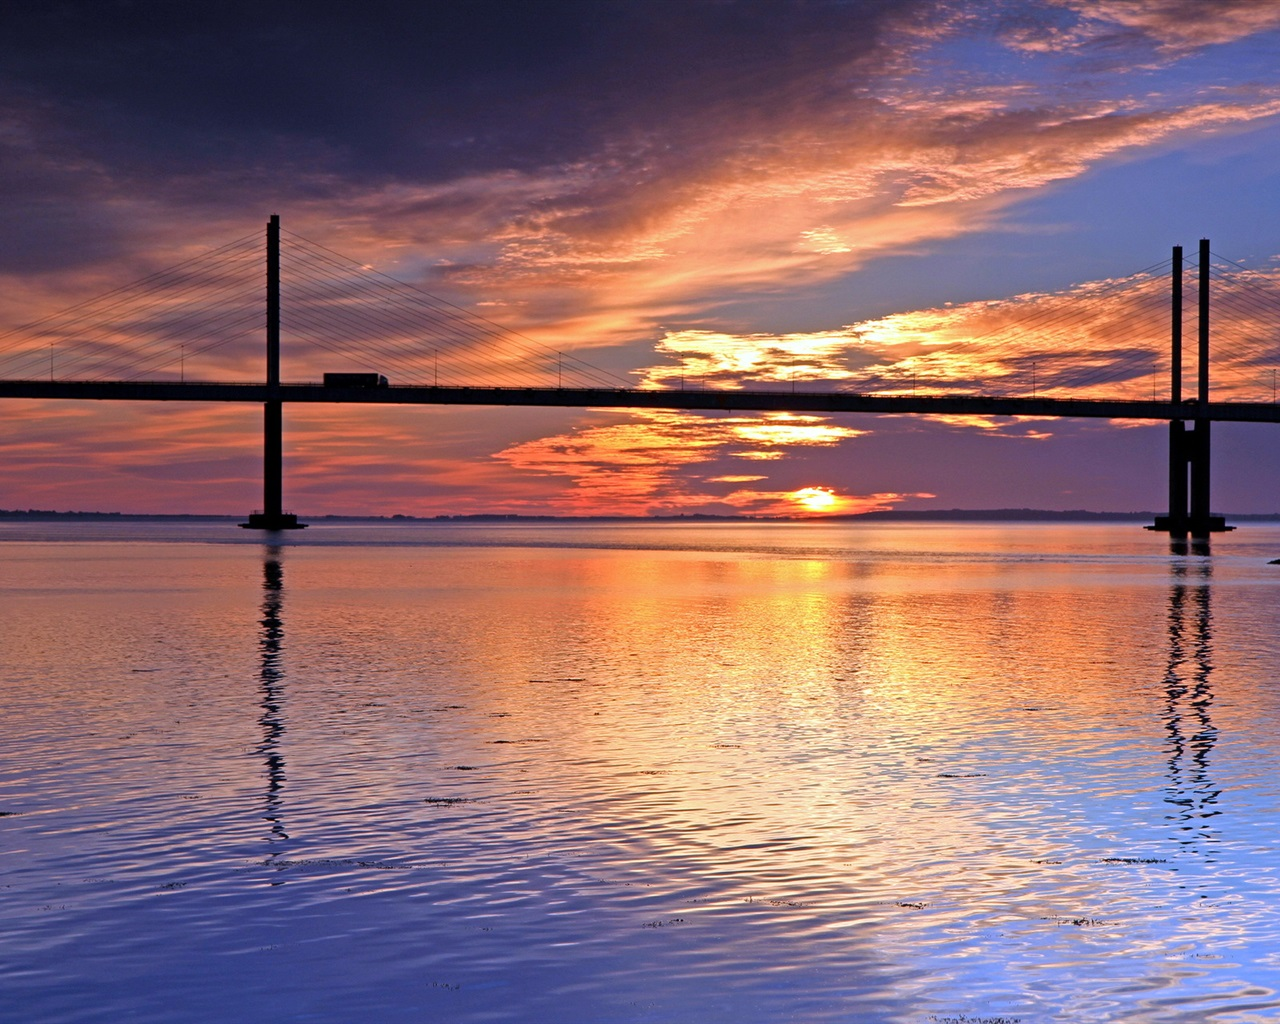 Download Wallpaper 1920x1080 River Sunset Bridge: Wallpaper Sunset, River, Bridge, Red Sky 1920x1200 HD